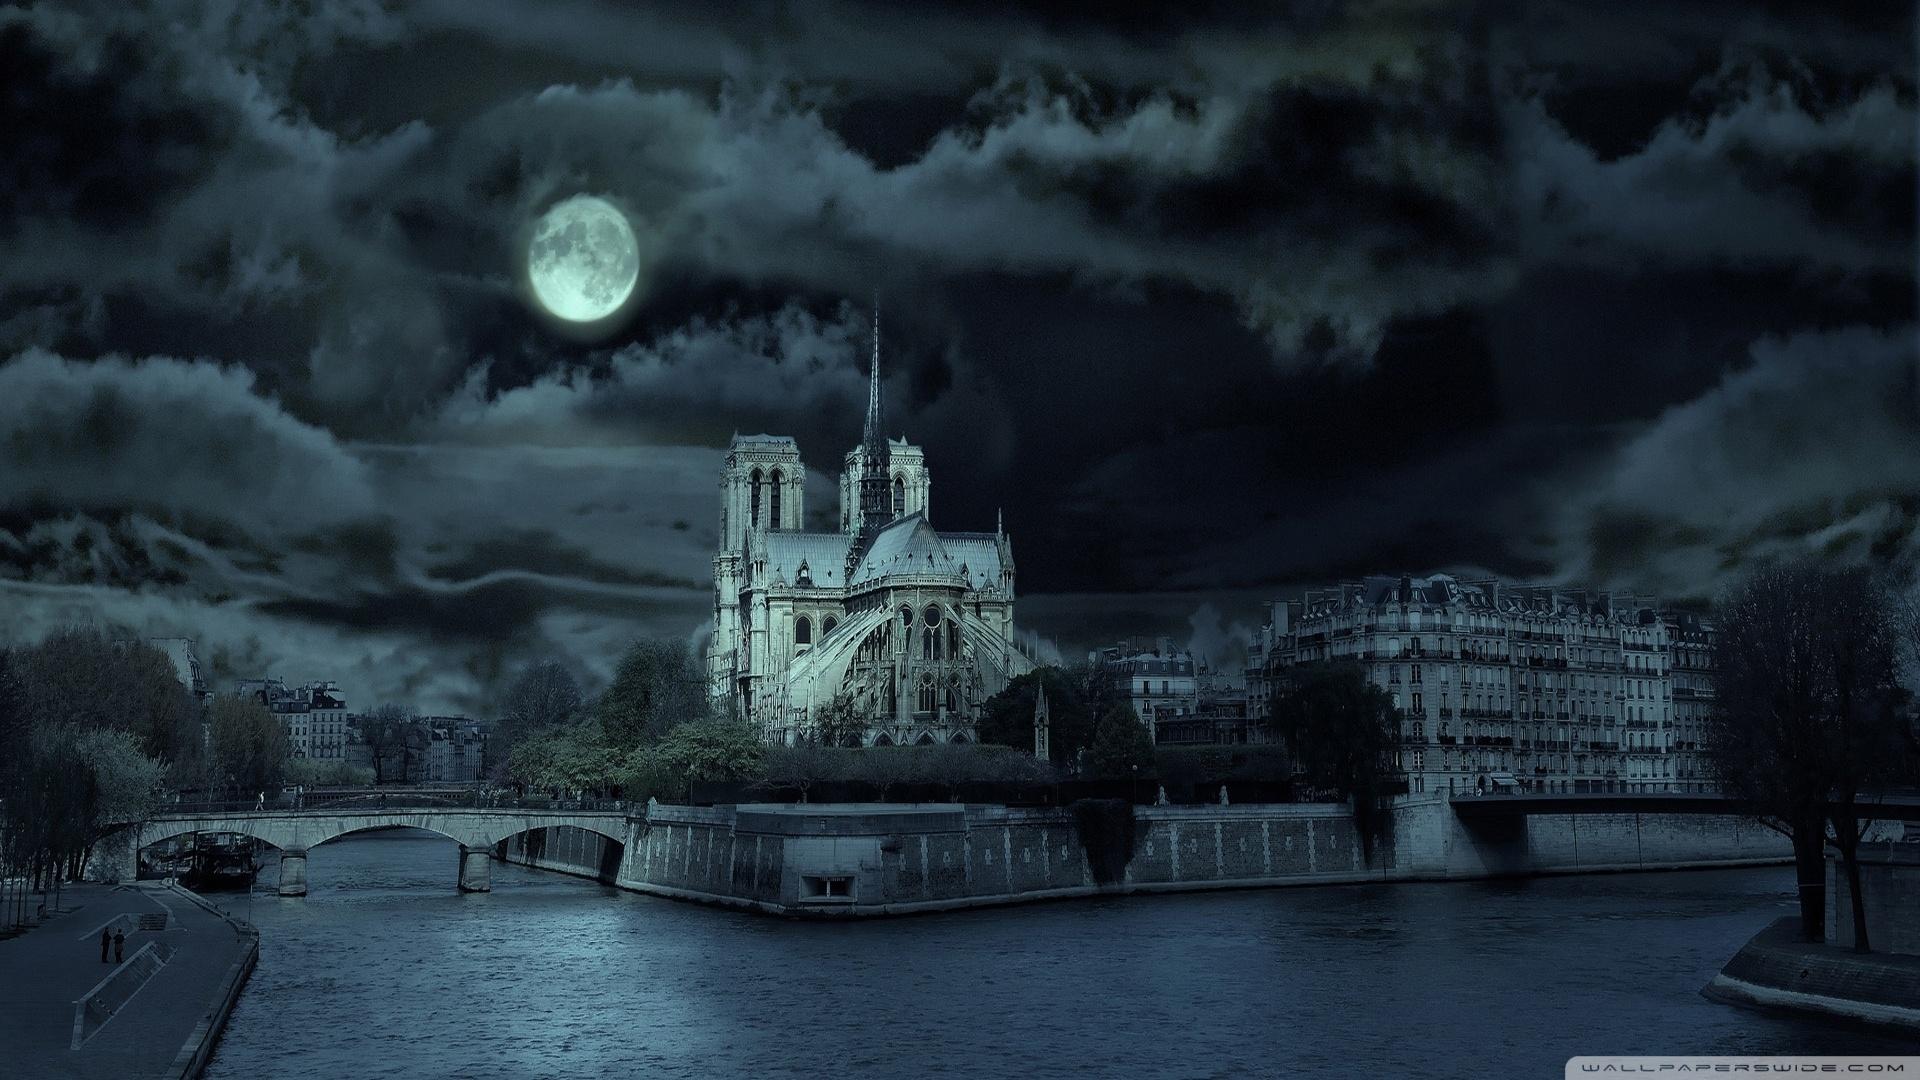 notre-dame-de-paris-at-night_00447848.jpg